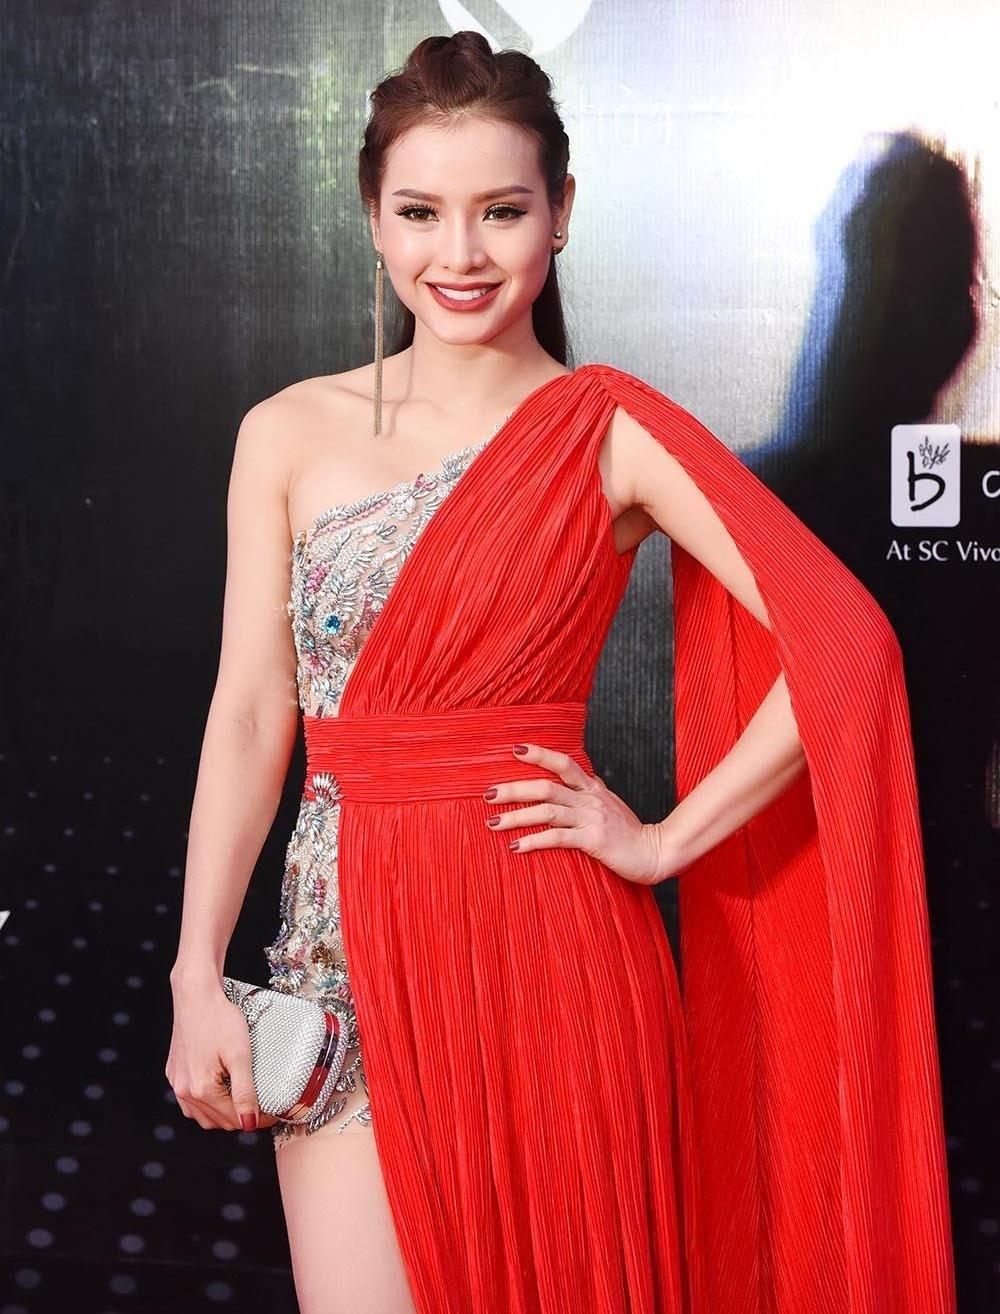 Phuong Trinh Jolie: 'Toi yeu va bo nhieu dan ong de tra thu cho me' hinh anh 2